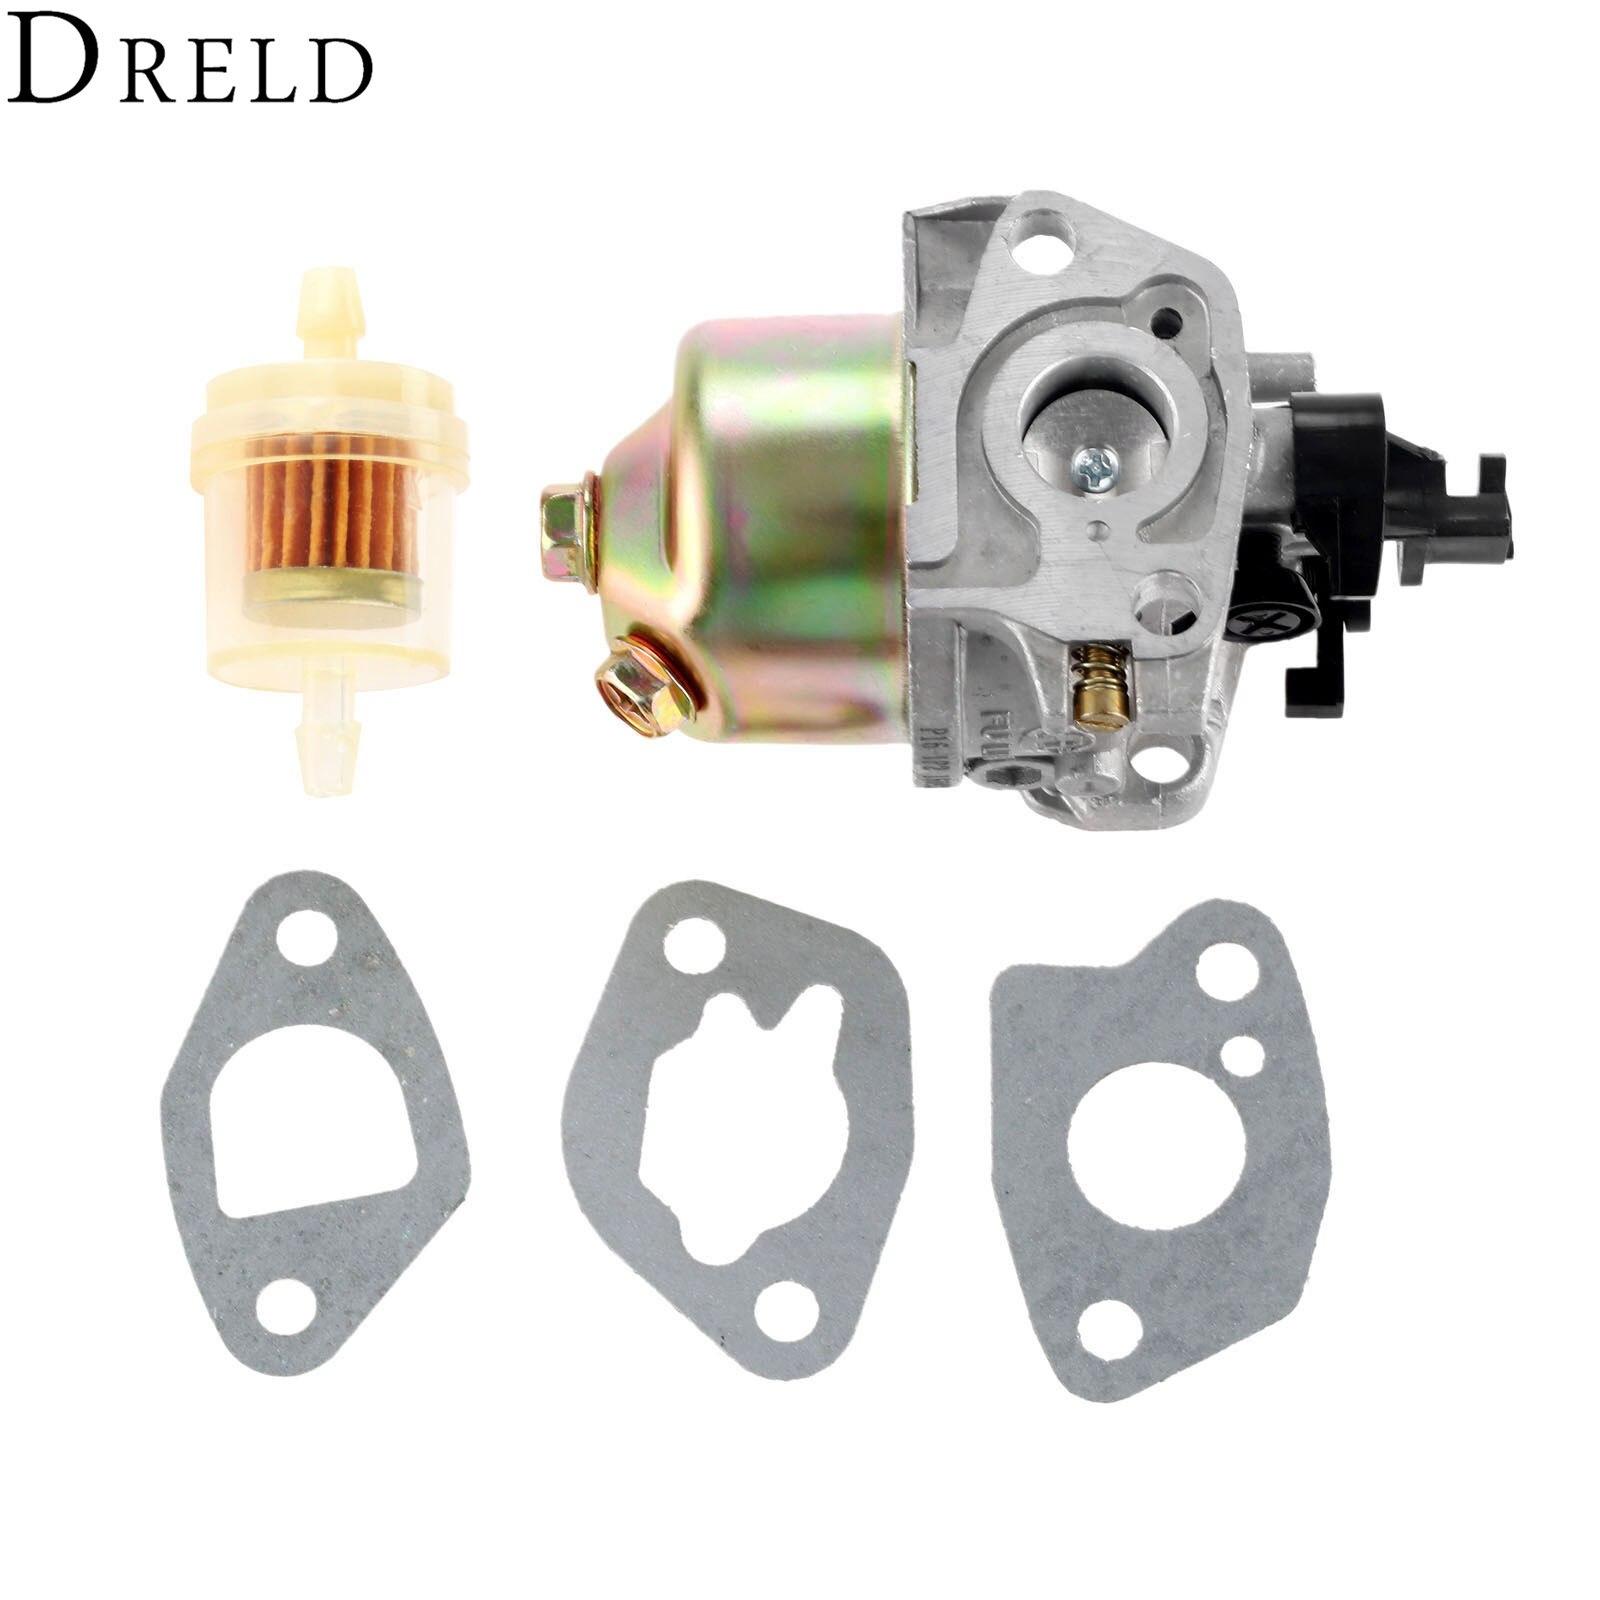 Carburador Dredd con junta de carburador filtro de combustible para MTD Cub cadete troy-bilt motores de cortacésped #951-10310 751-10310